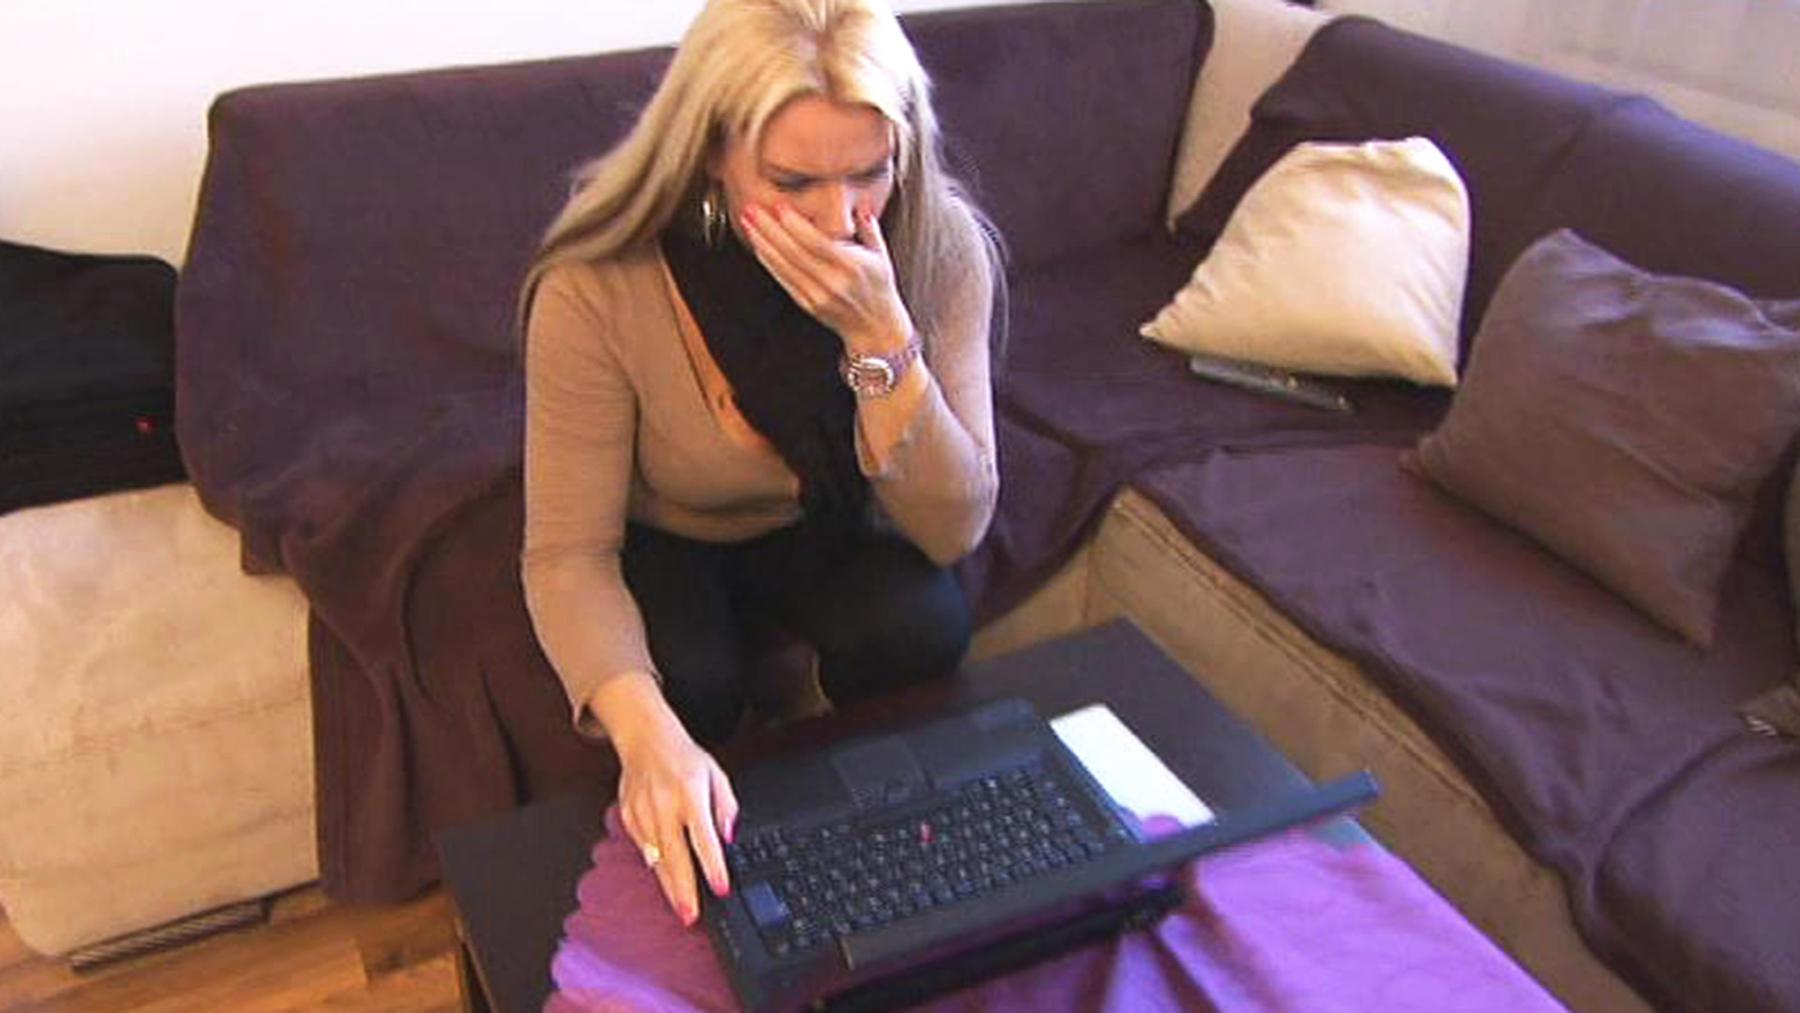 Frau blamiert Familie in Internet-Forum   Folge 118